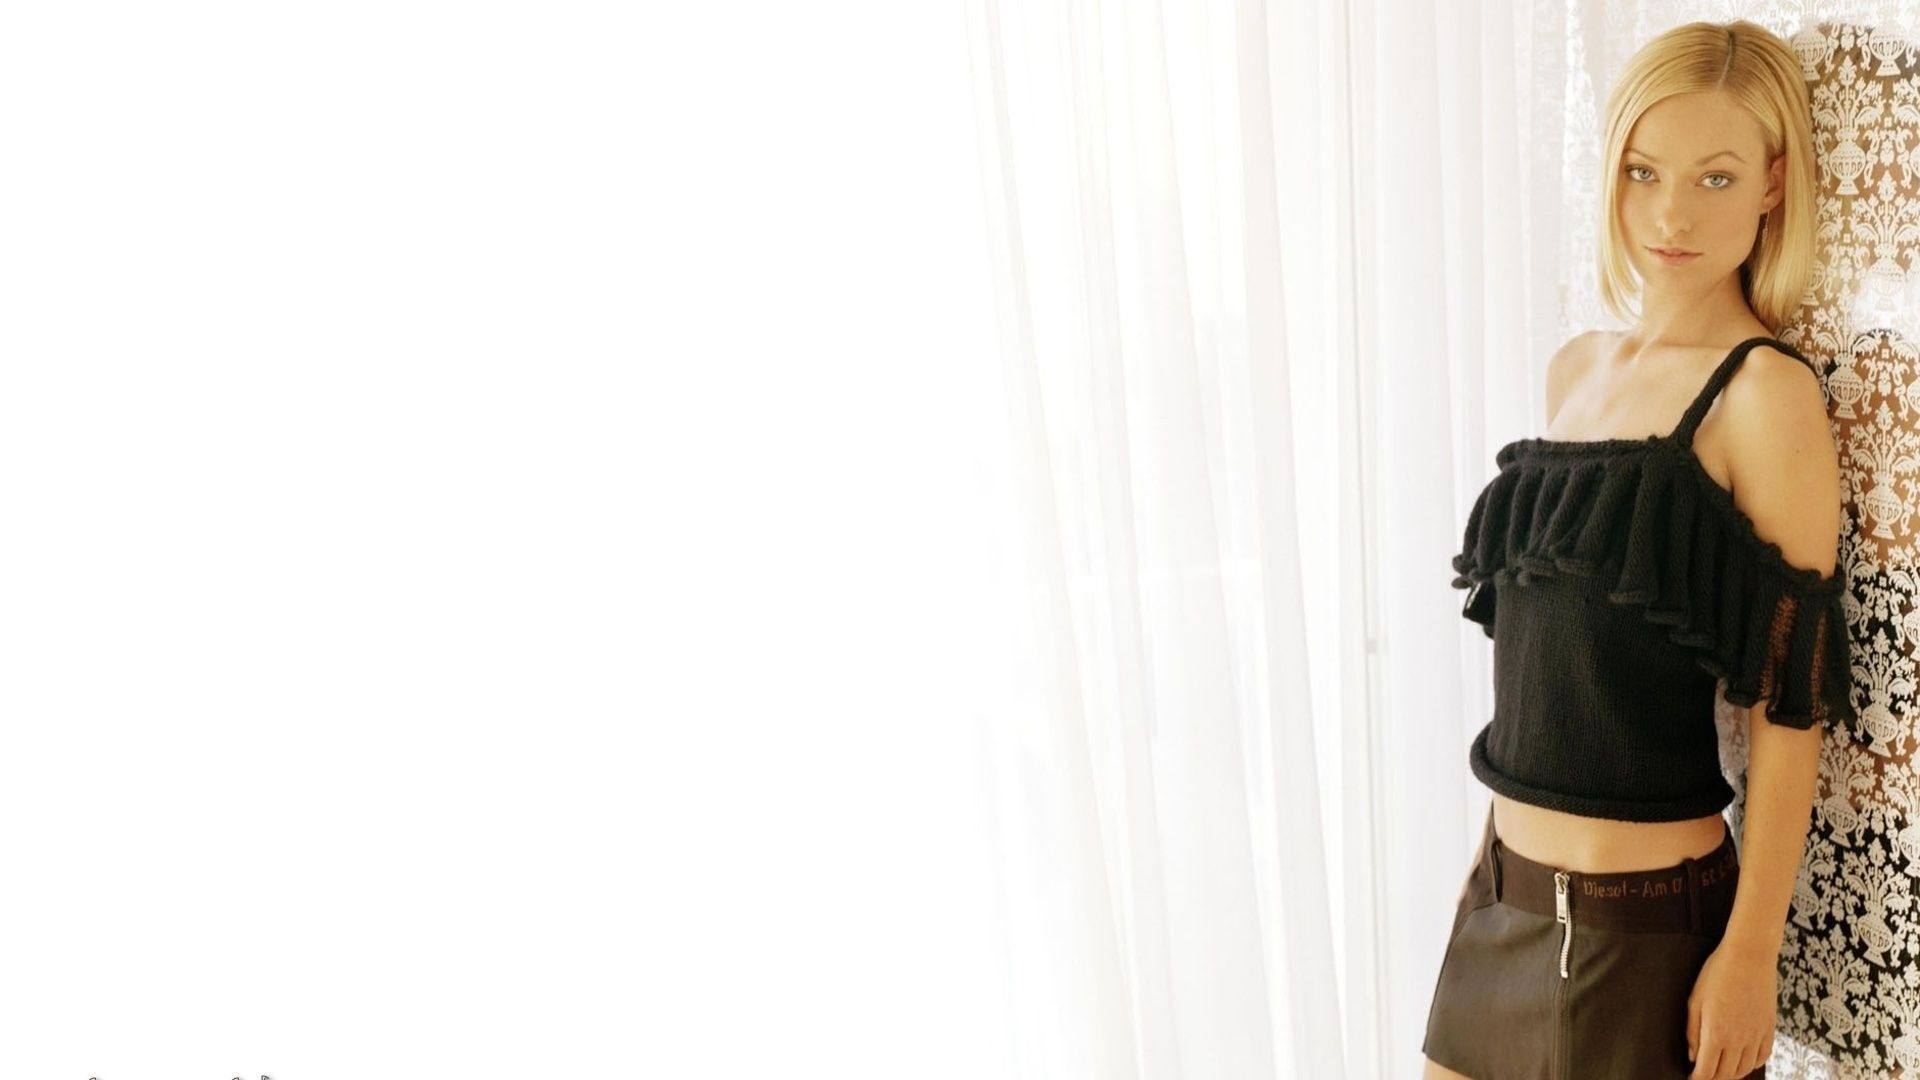 Оливия Уайлд красивые обои #12 - 1920x1080 ... оливия уайлд